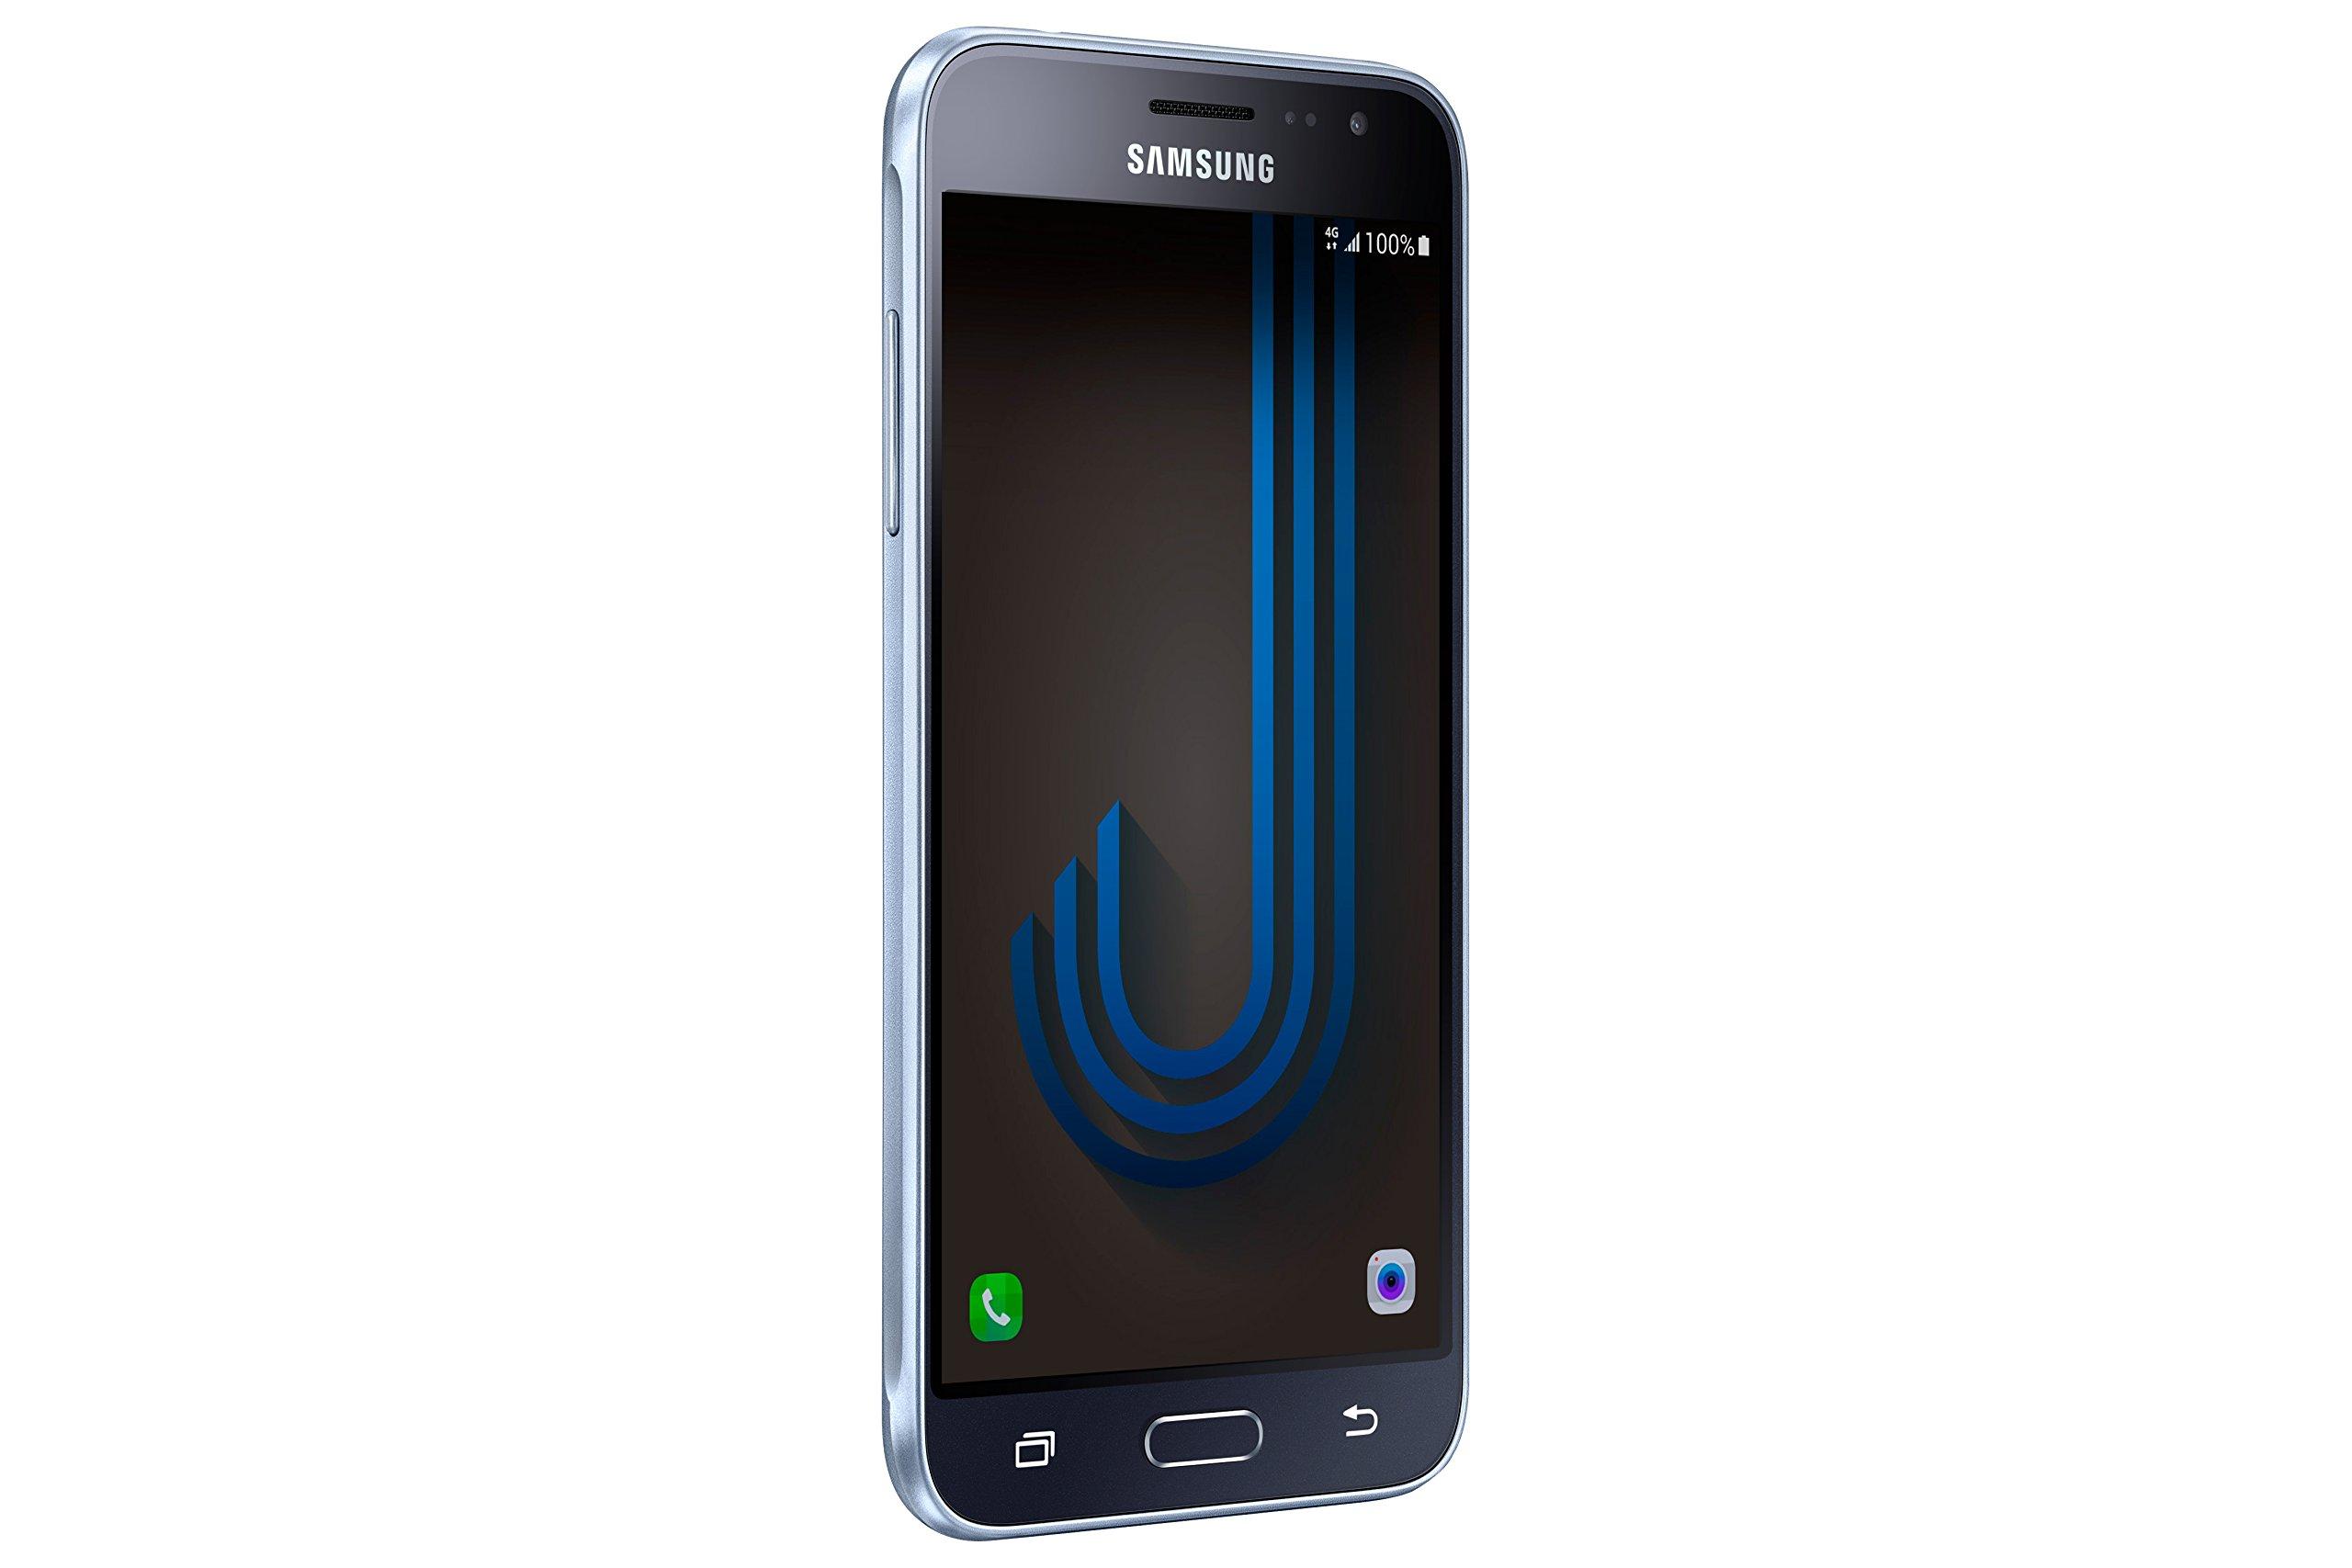 Tim Samsung Galaxy J3 SIM única 4G 8GB Negro: Amazon.es: Electrónica